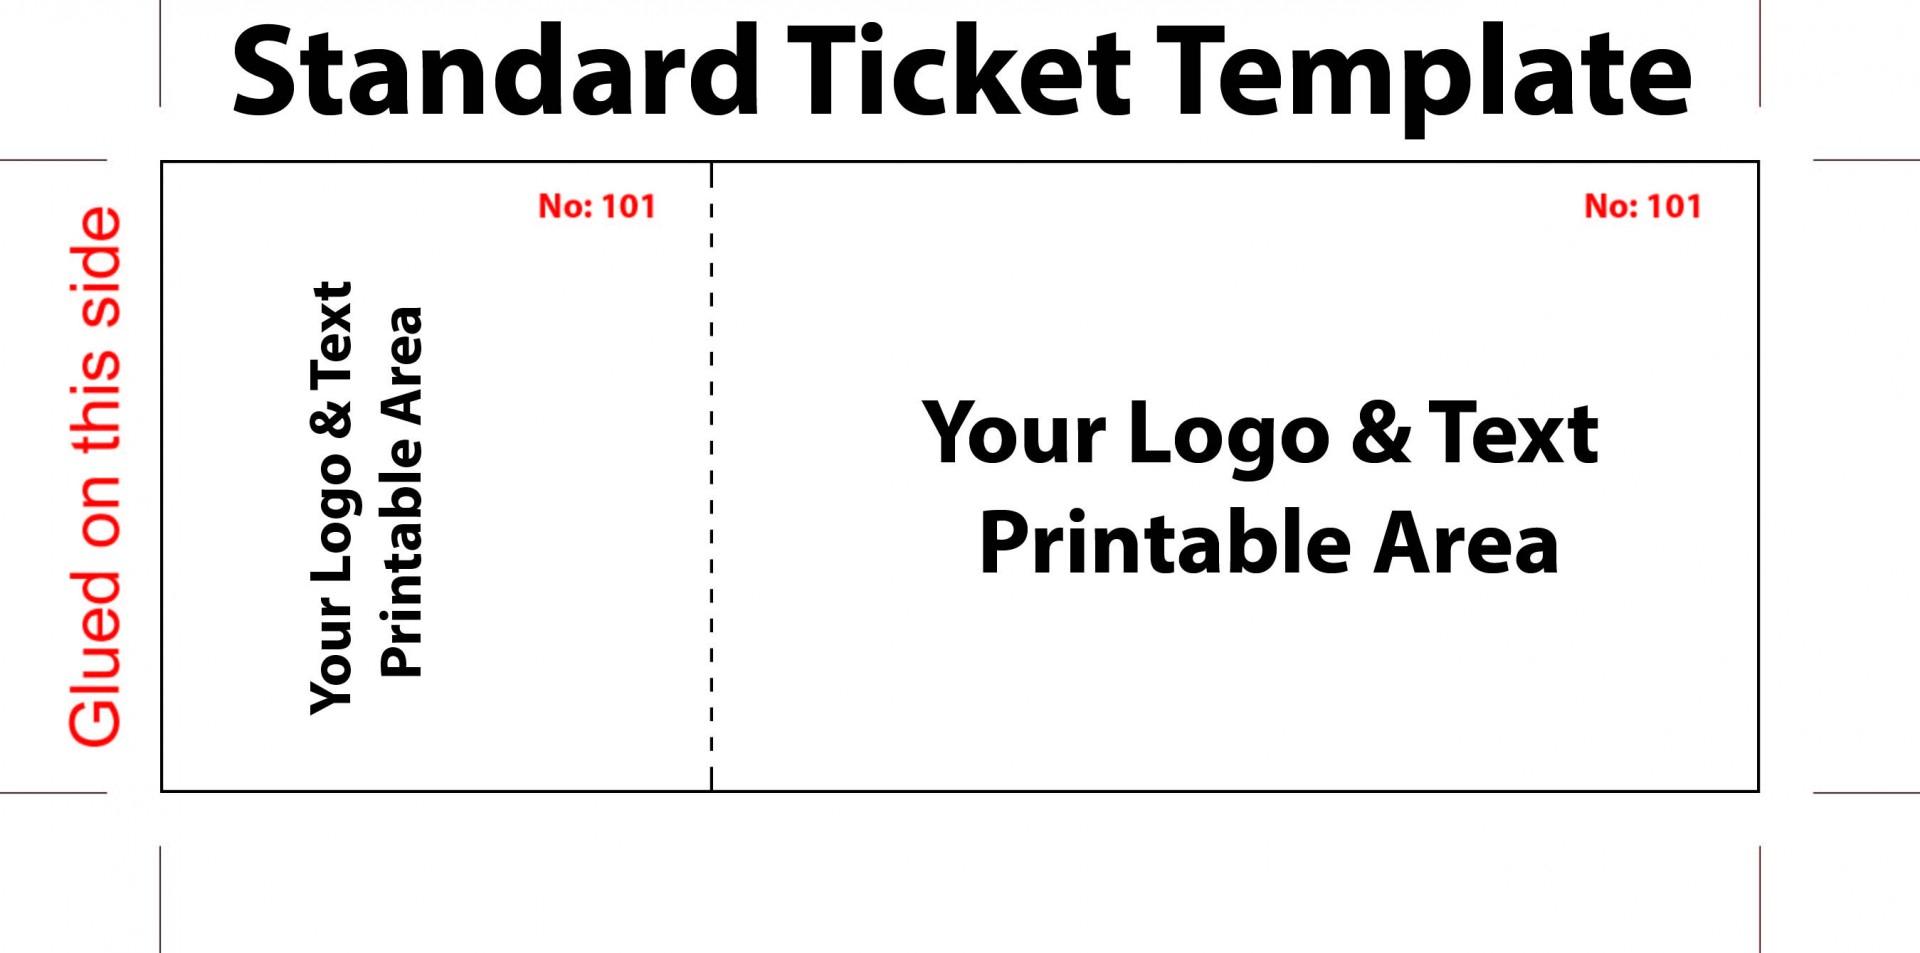 004 Ticket Invitation Template Free Ideas Movie ~ Ulyssesroom - Make Your Own Tickets Free Printable